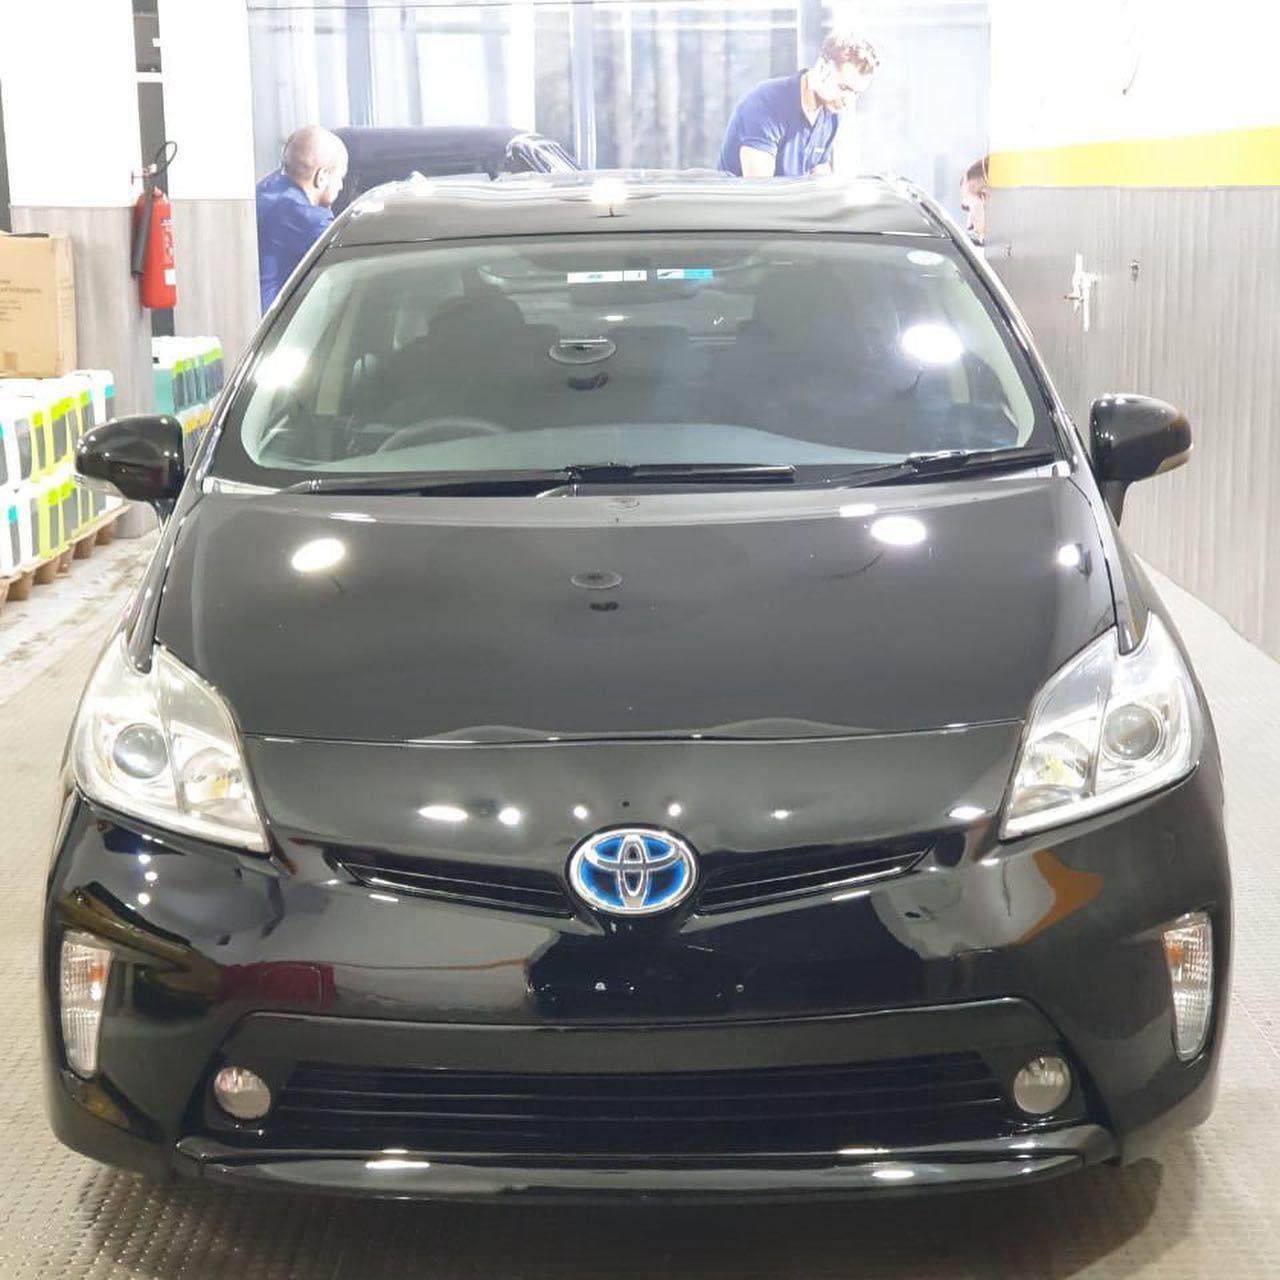 Toyota Prius S 1.8 2015